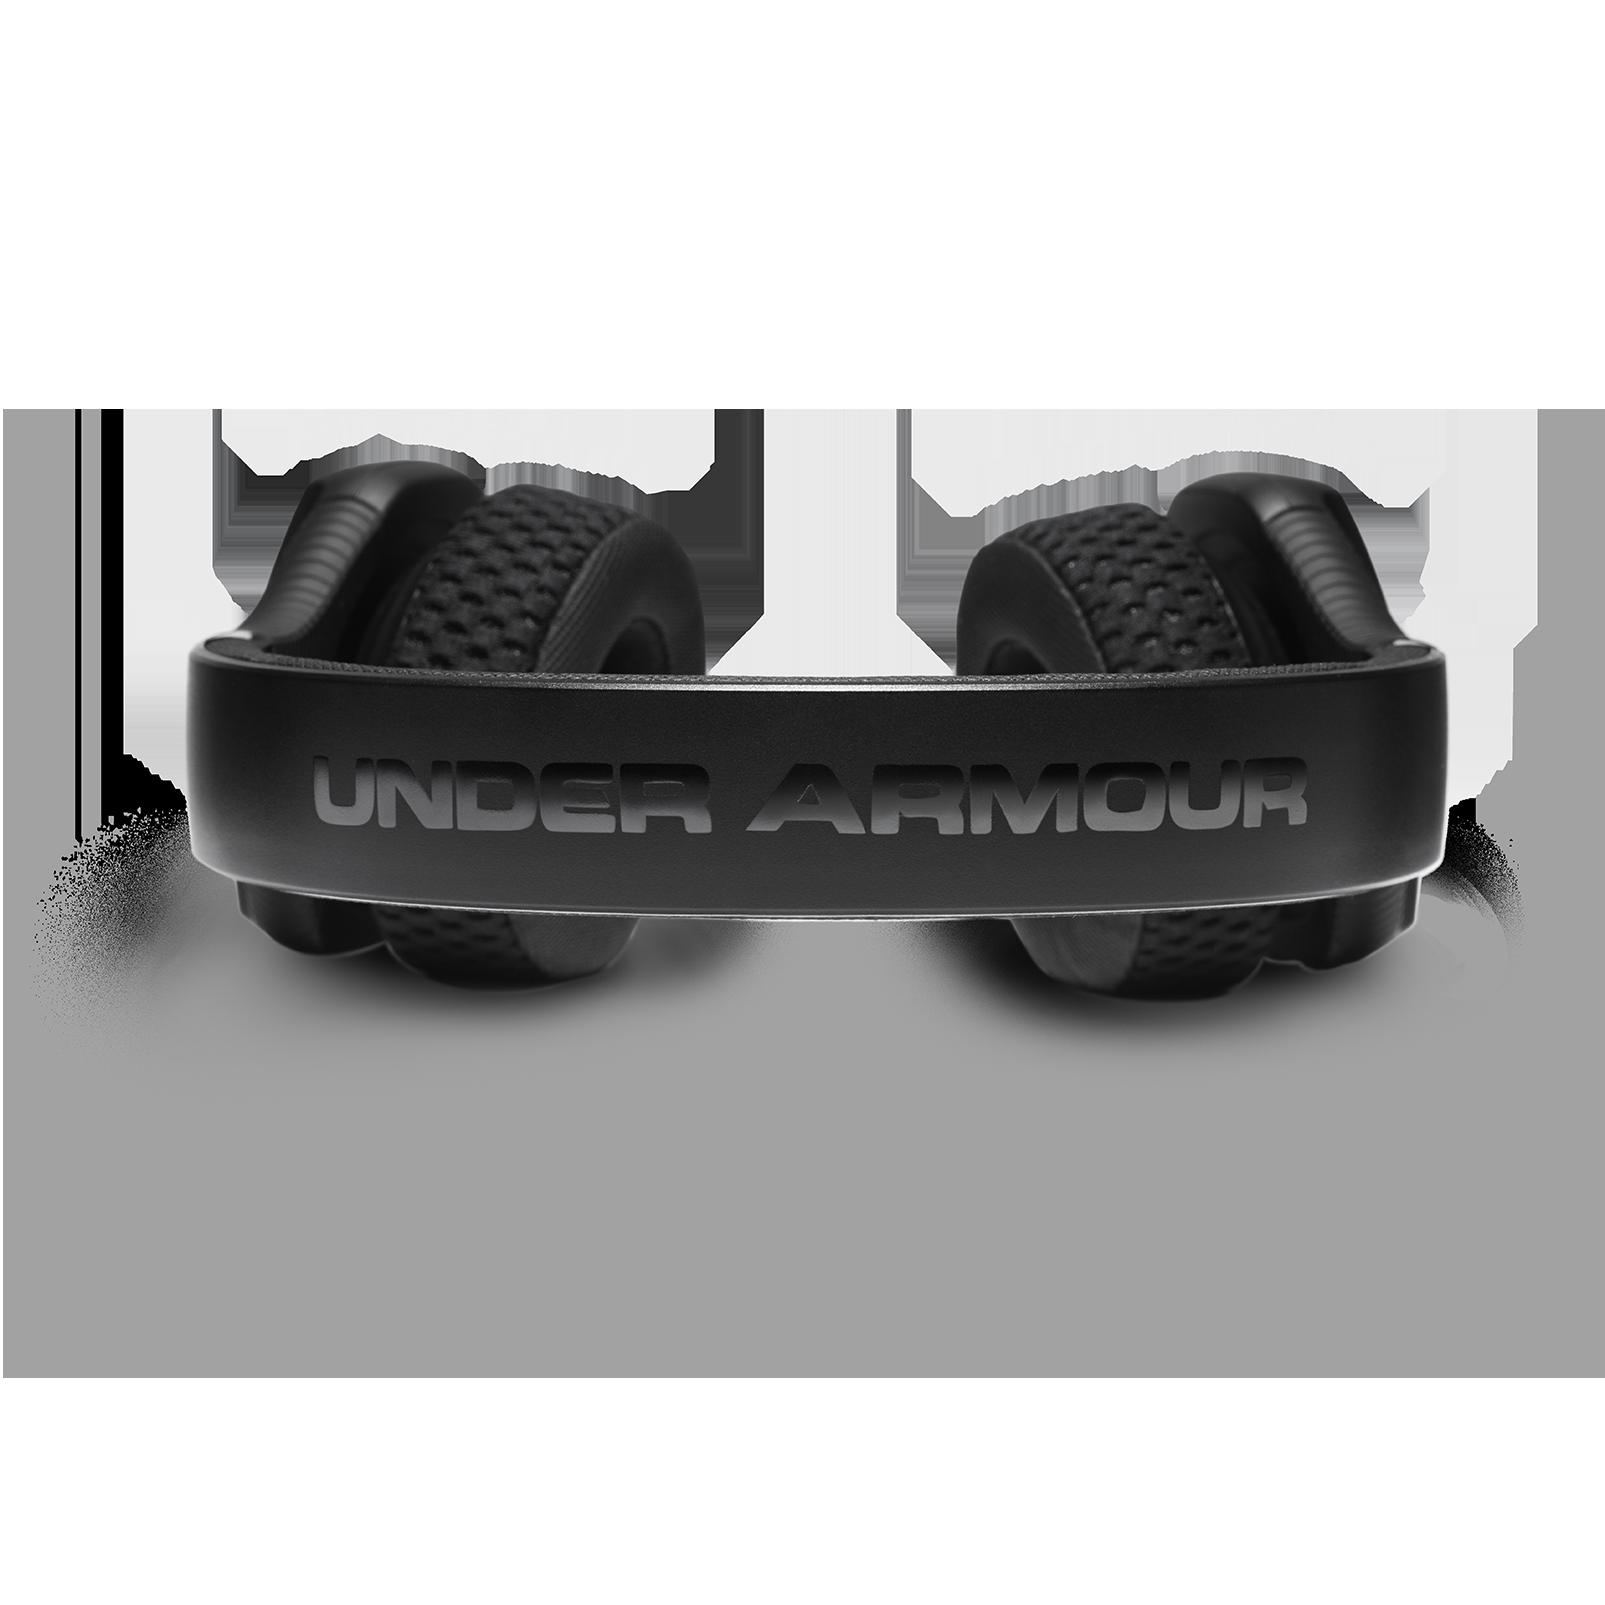 UA Sport Wireless Train – Engineered by JBL - Black / Red - Wireless on-ear headphone built for the gym - Detailshot 4